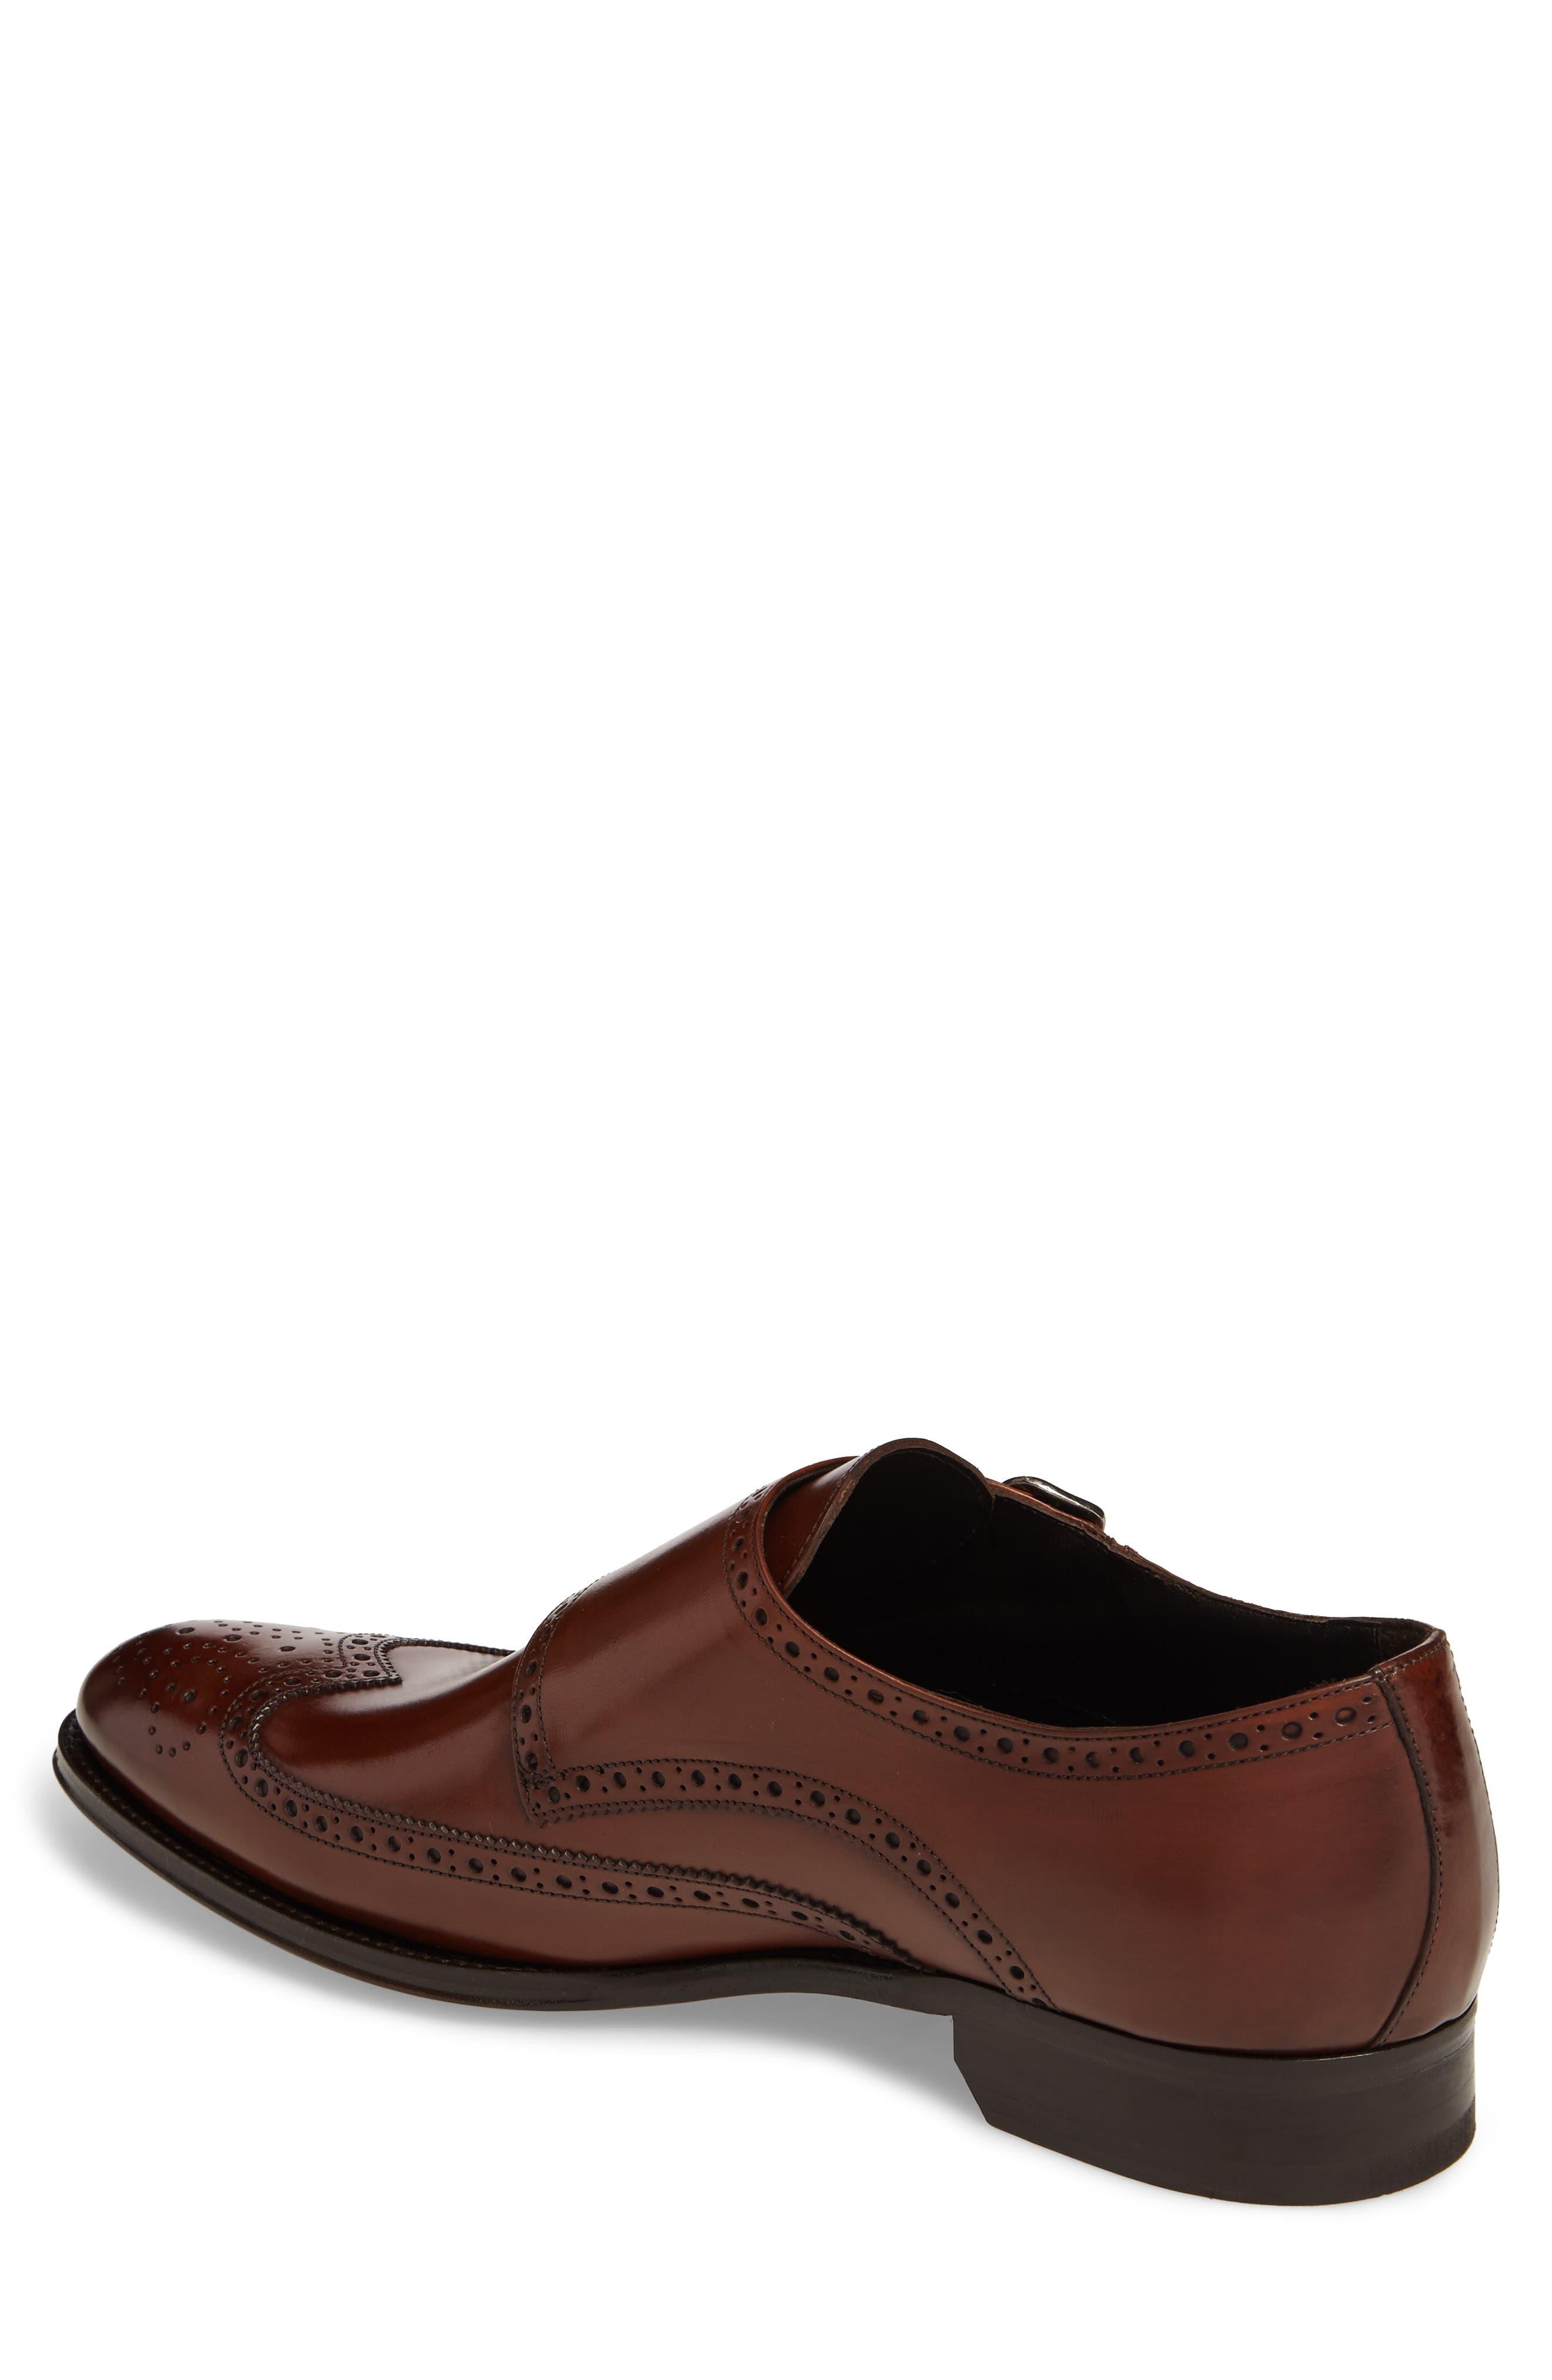 Pike Double Monk Strap Shoe,                             Alternate thumbnail 2, color,                             237